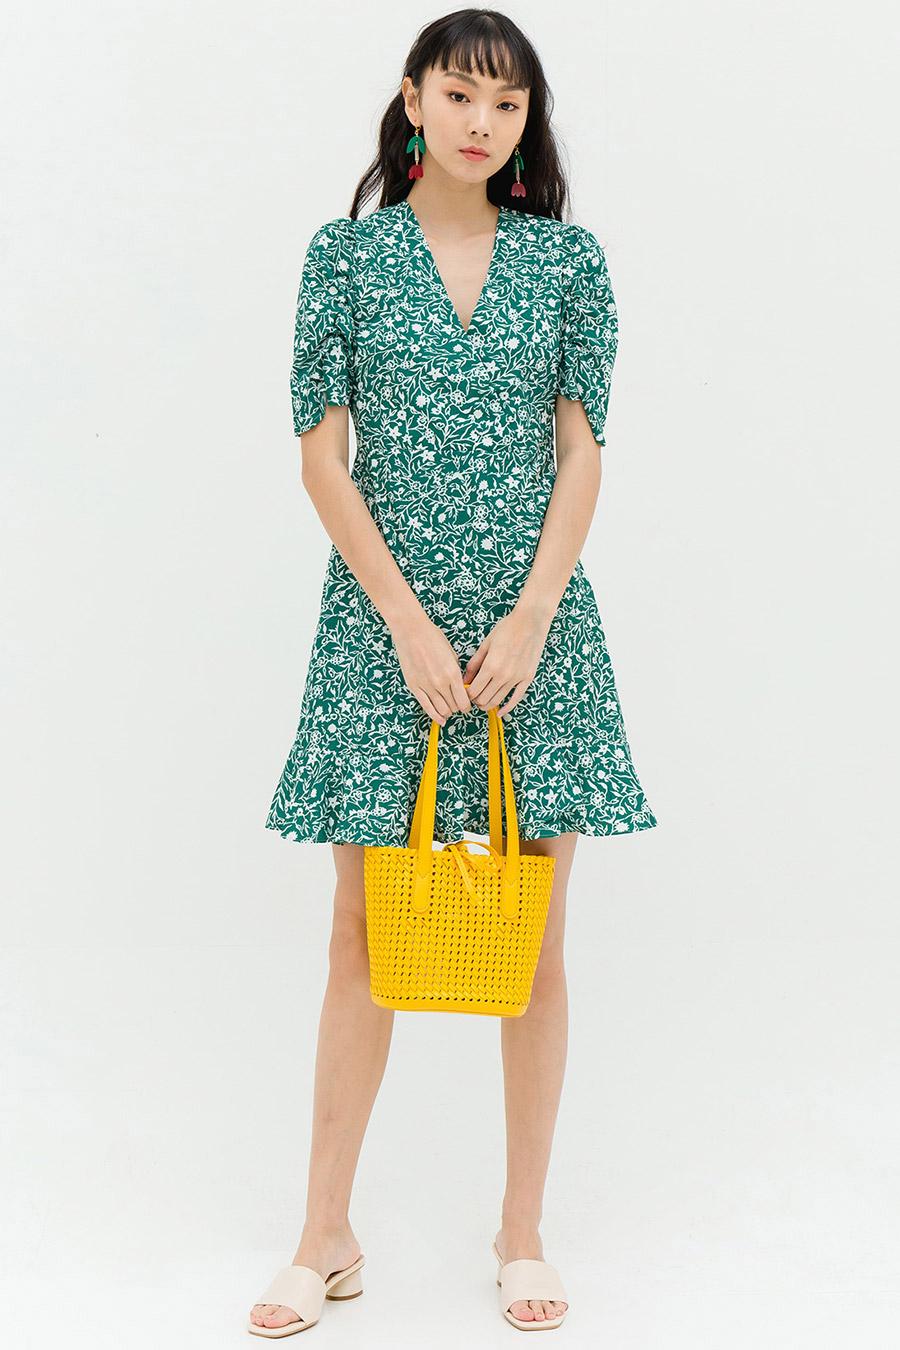 KIARA DRESS - GRASS FLEUR